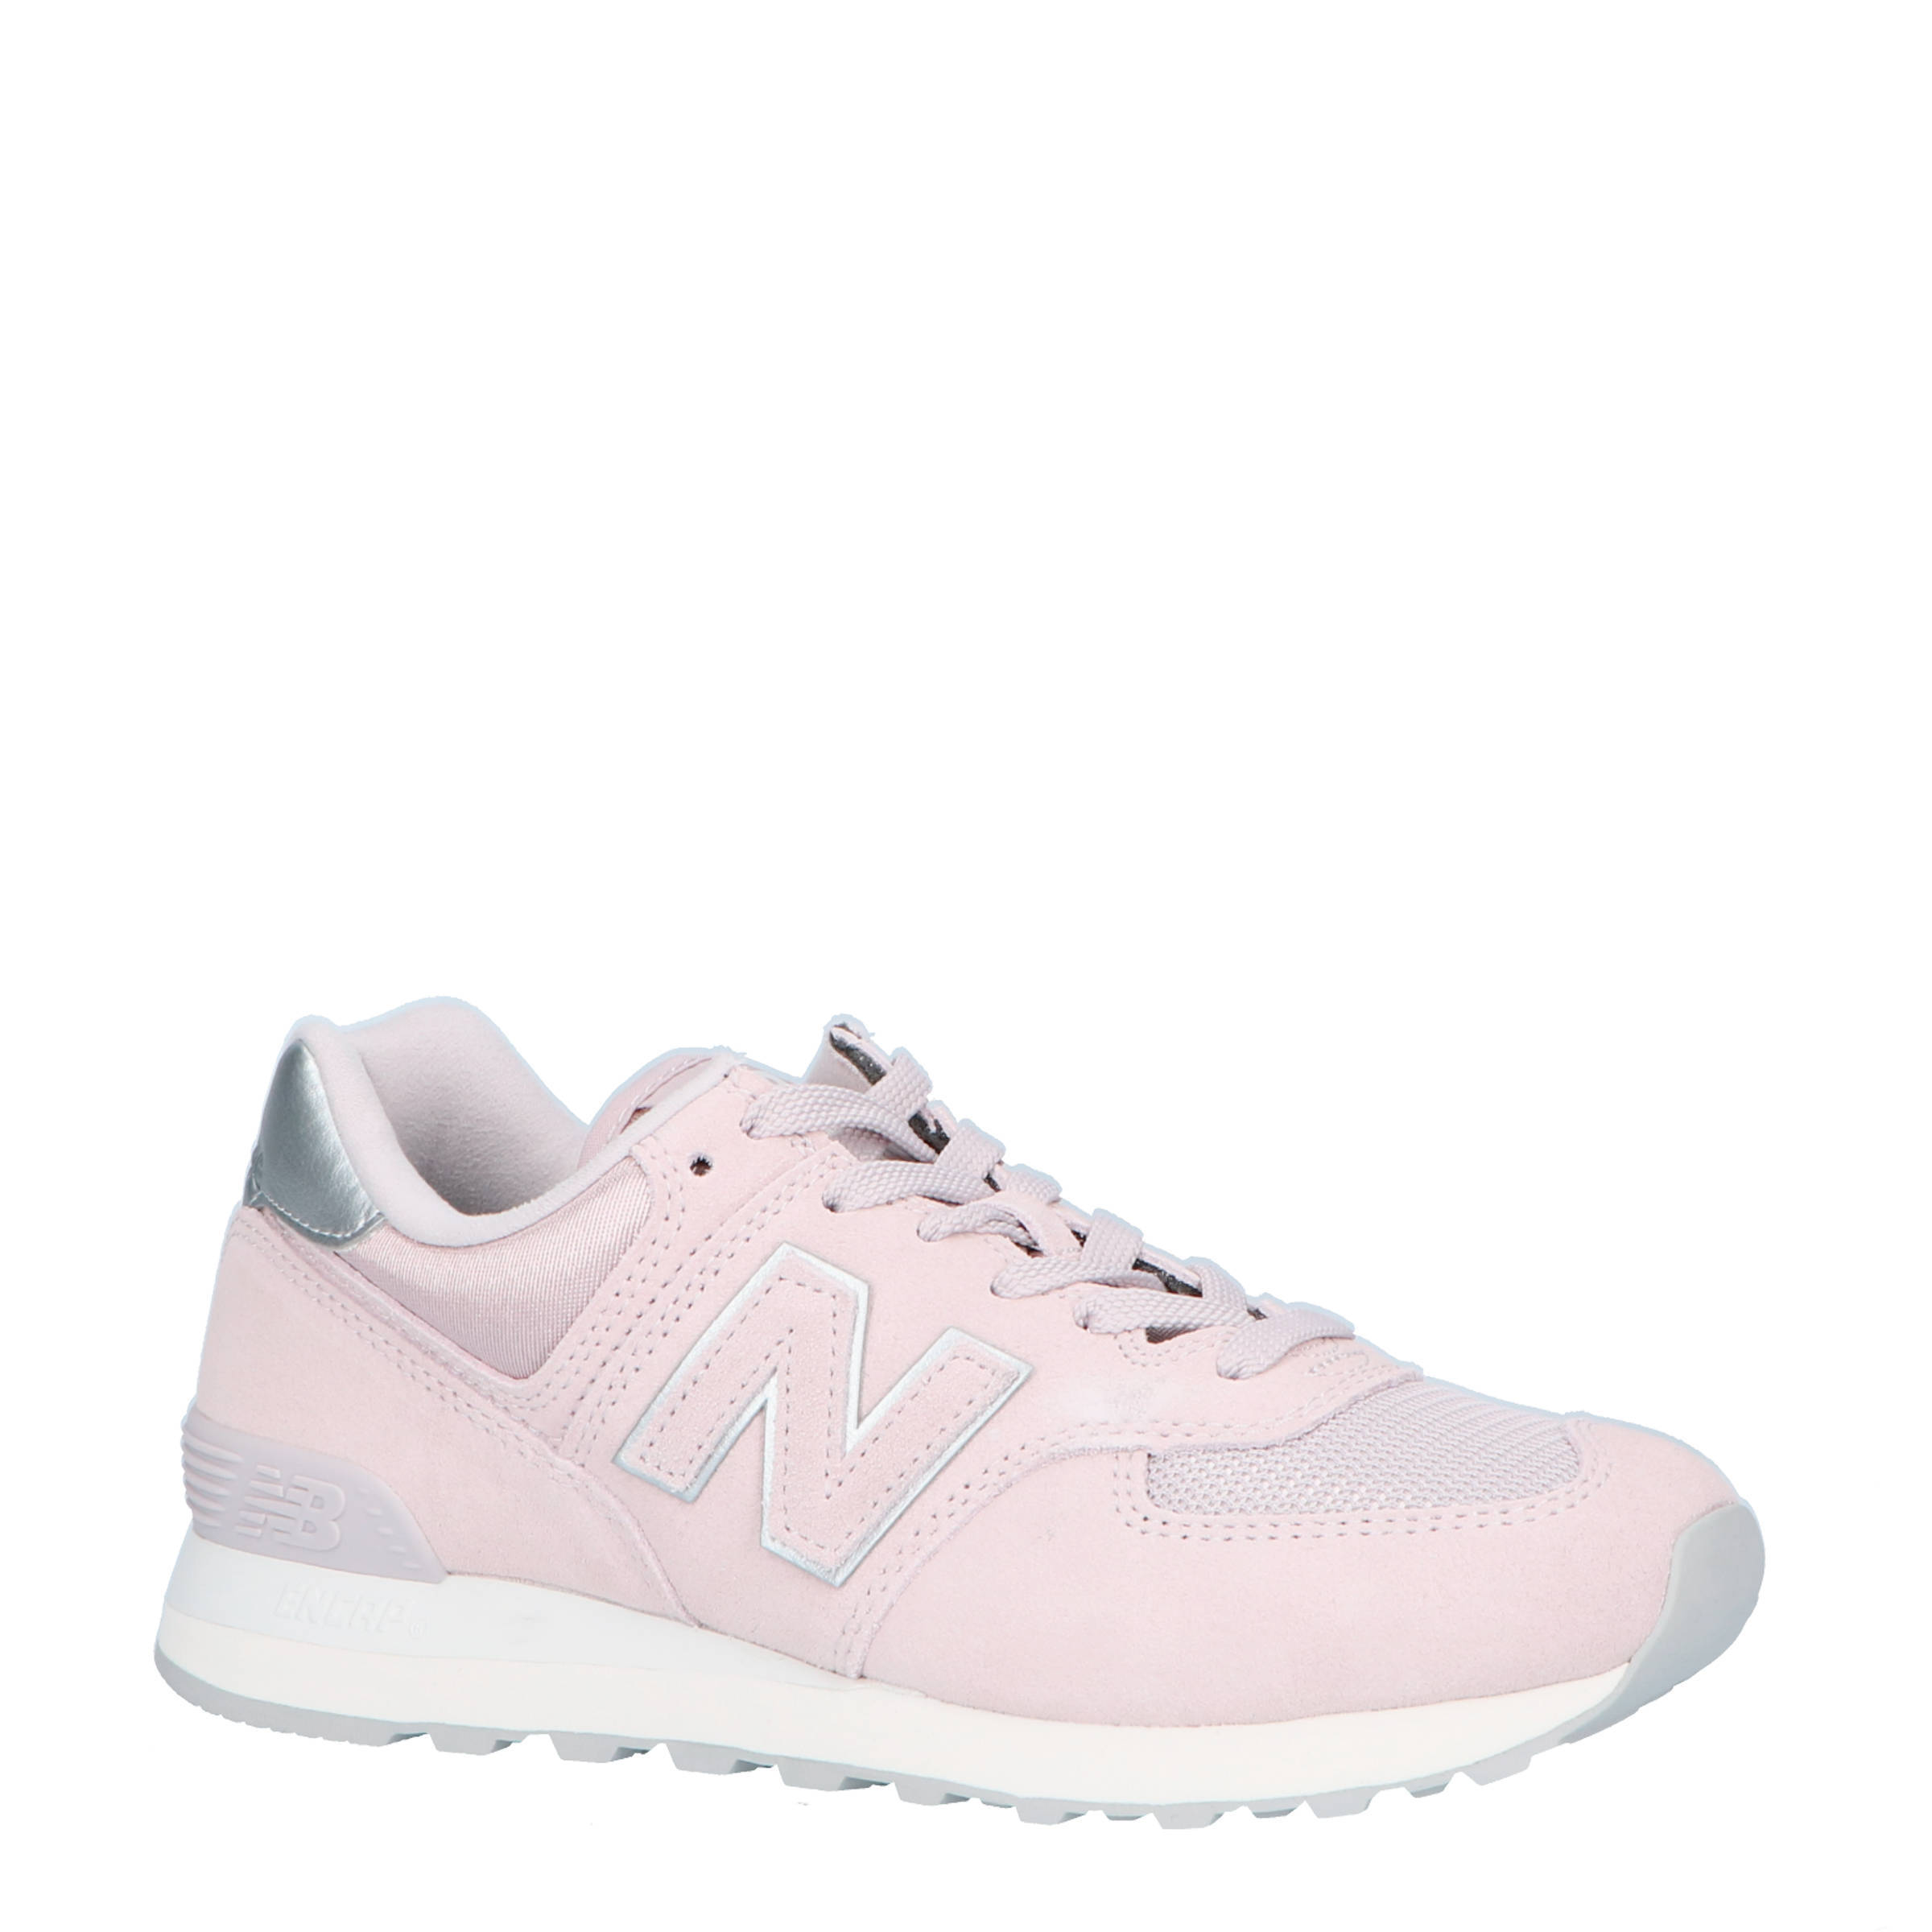 Wl574 Balance New Wehkamp Lilapaars Sneakers HPq5q4x